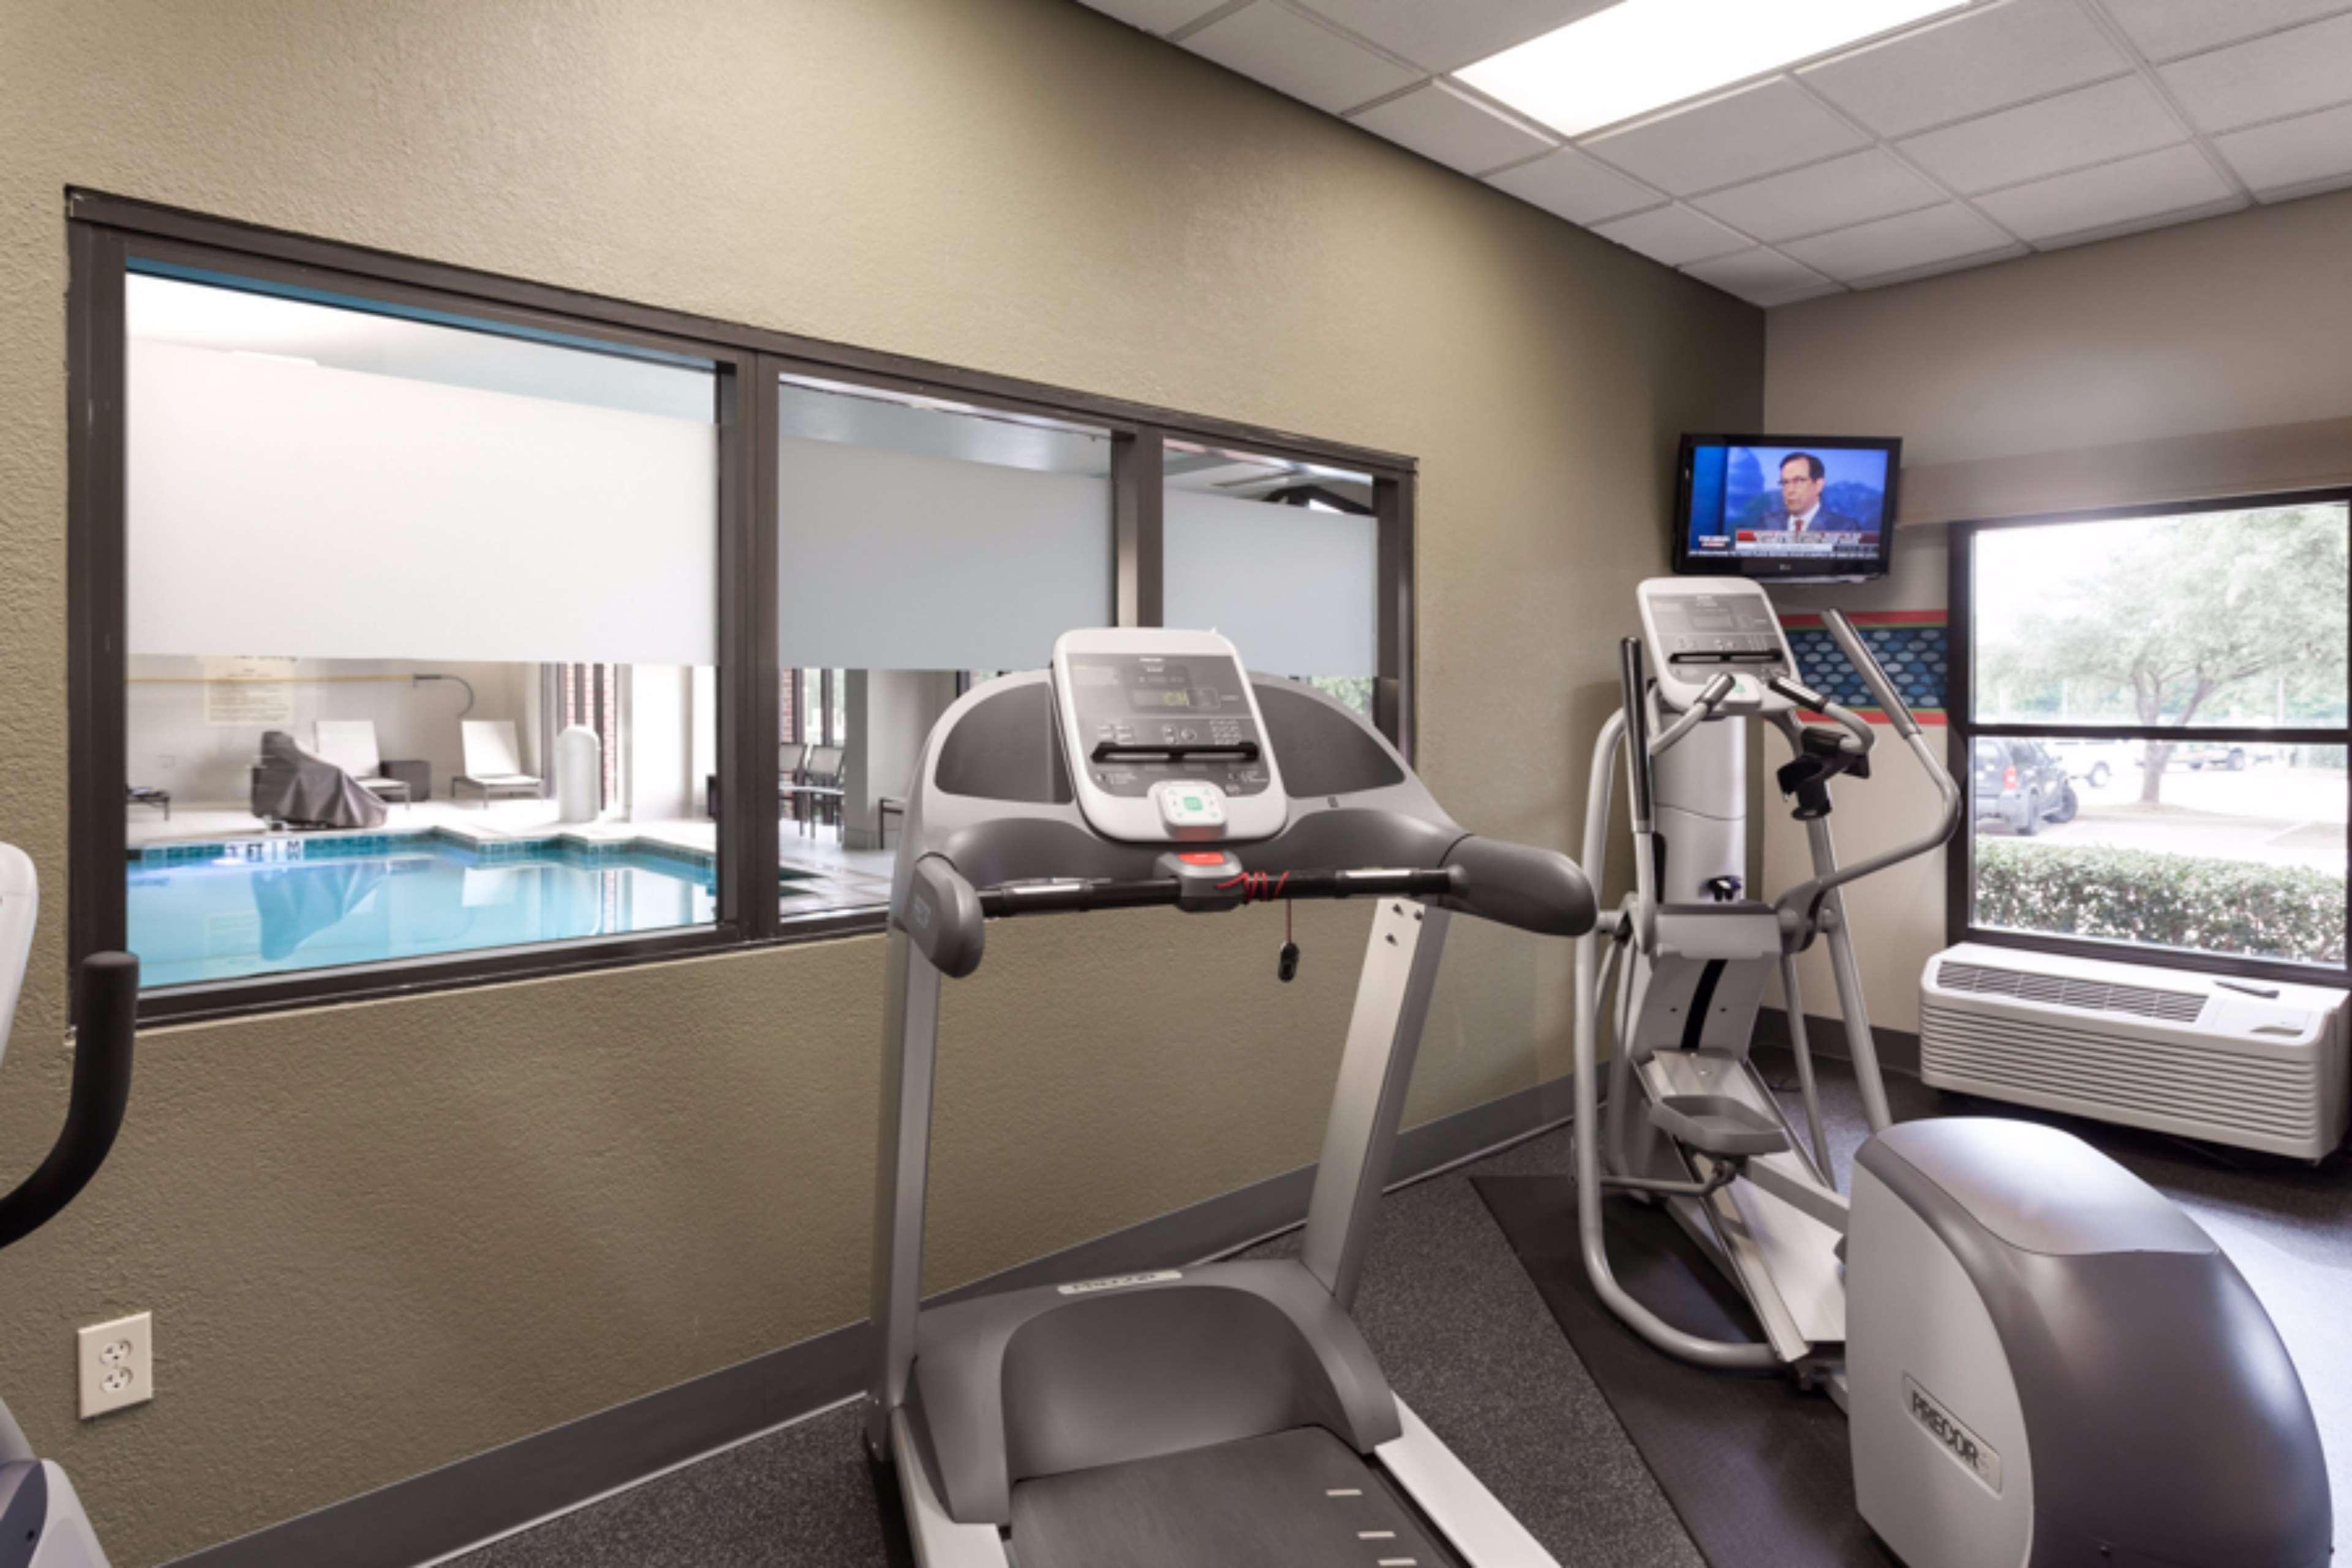 Hampton Inn & Suites Dallas-DFW Airport North-Grapevine image 12